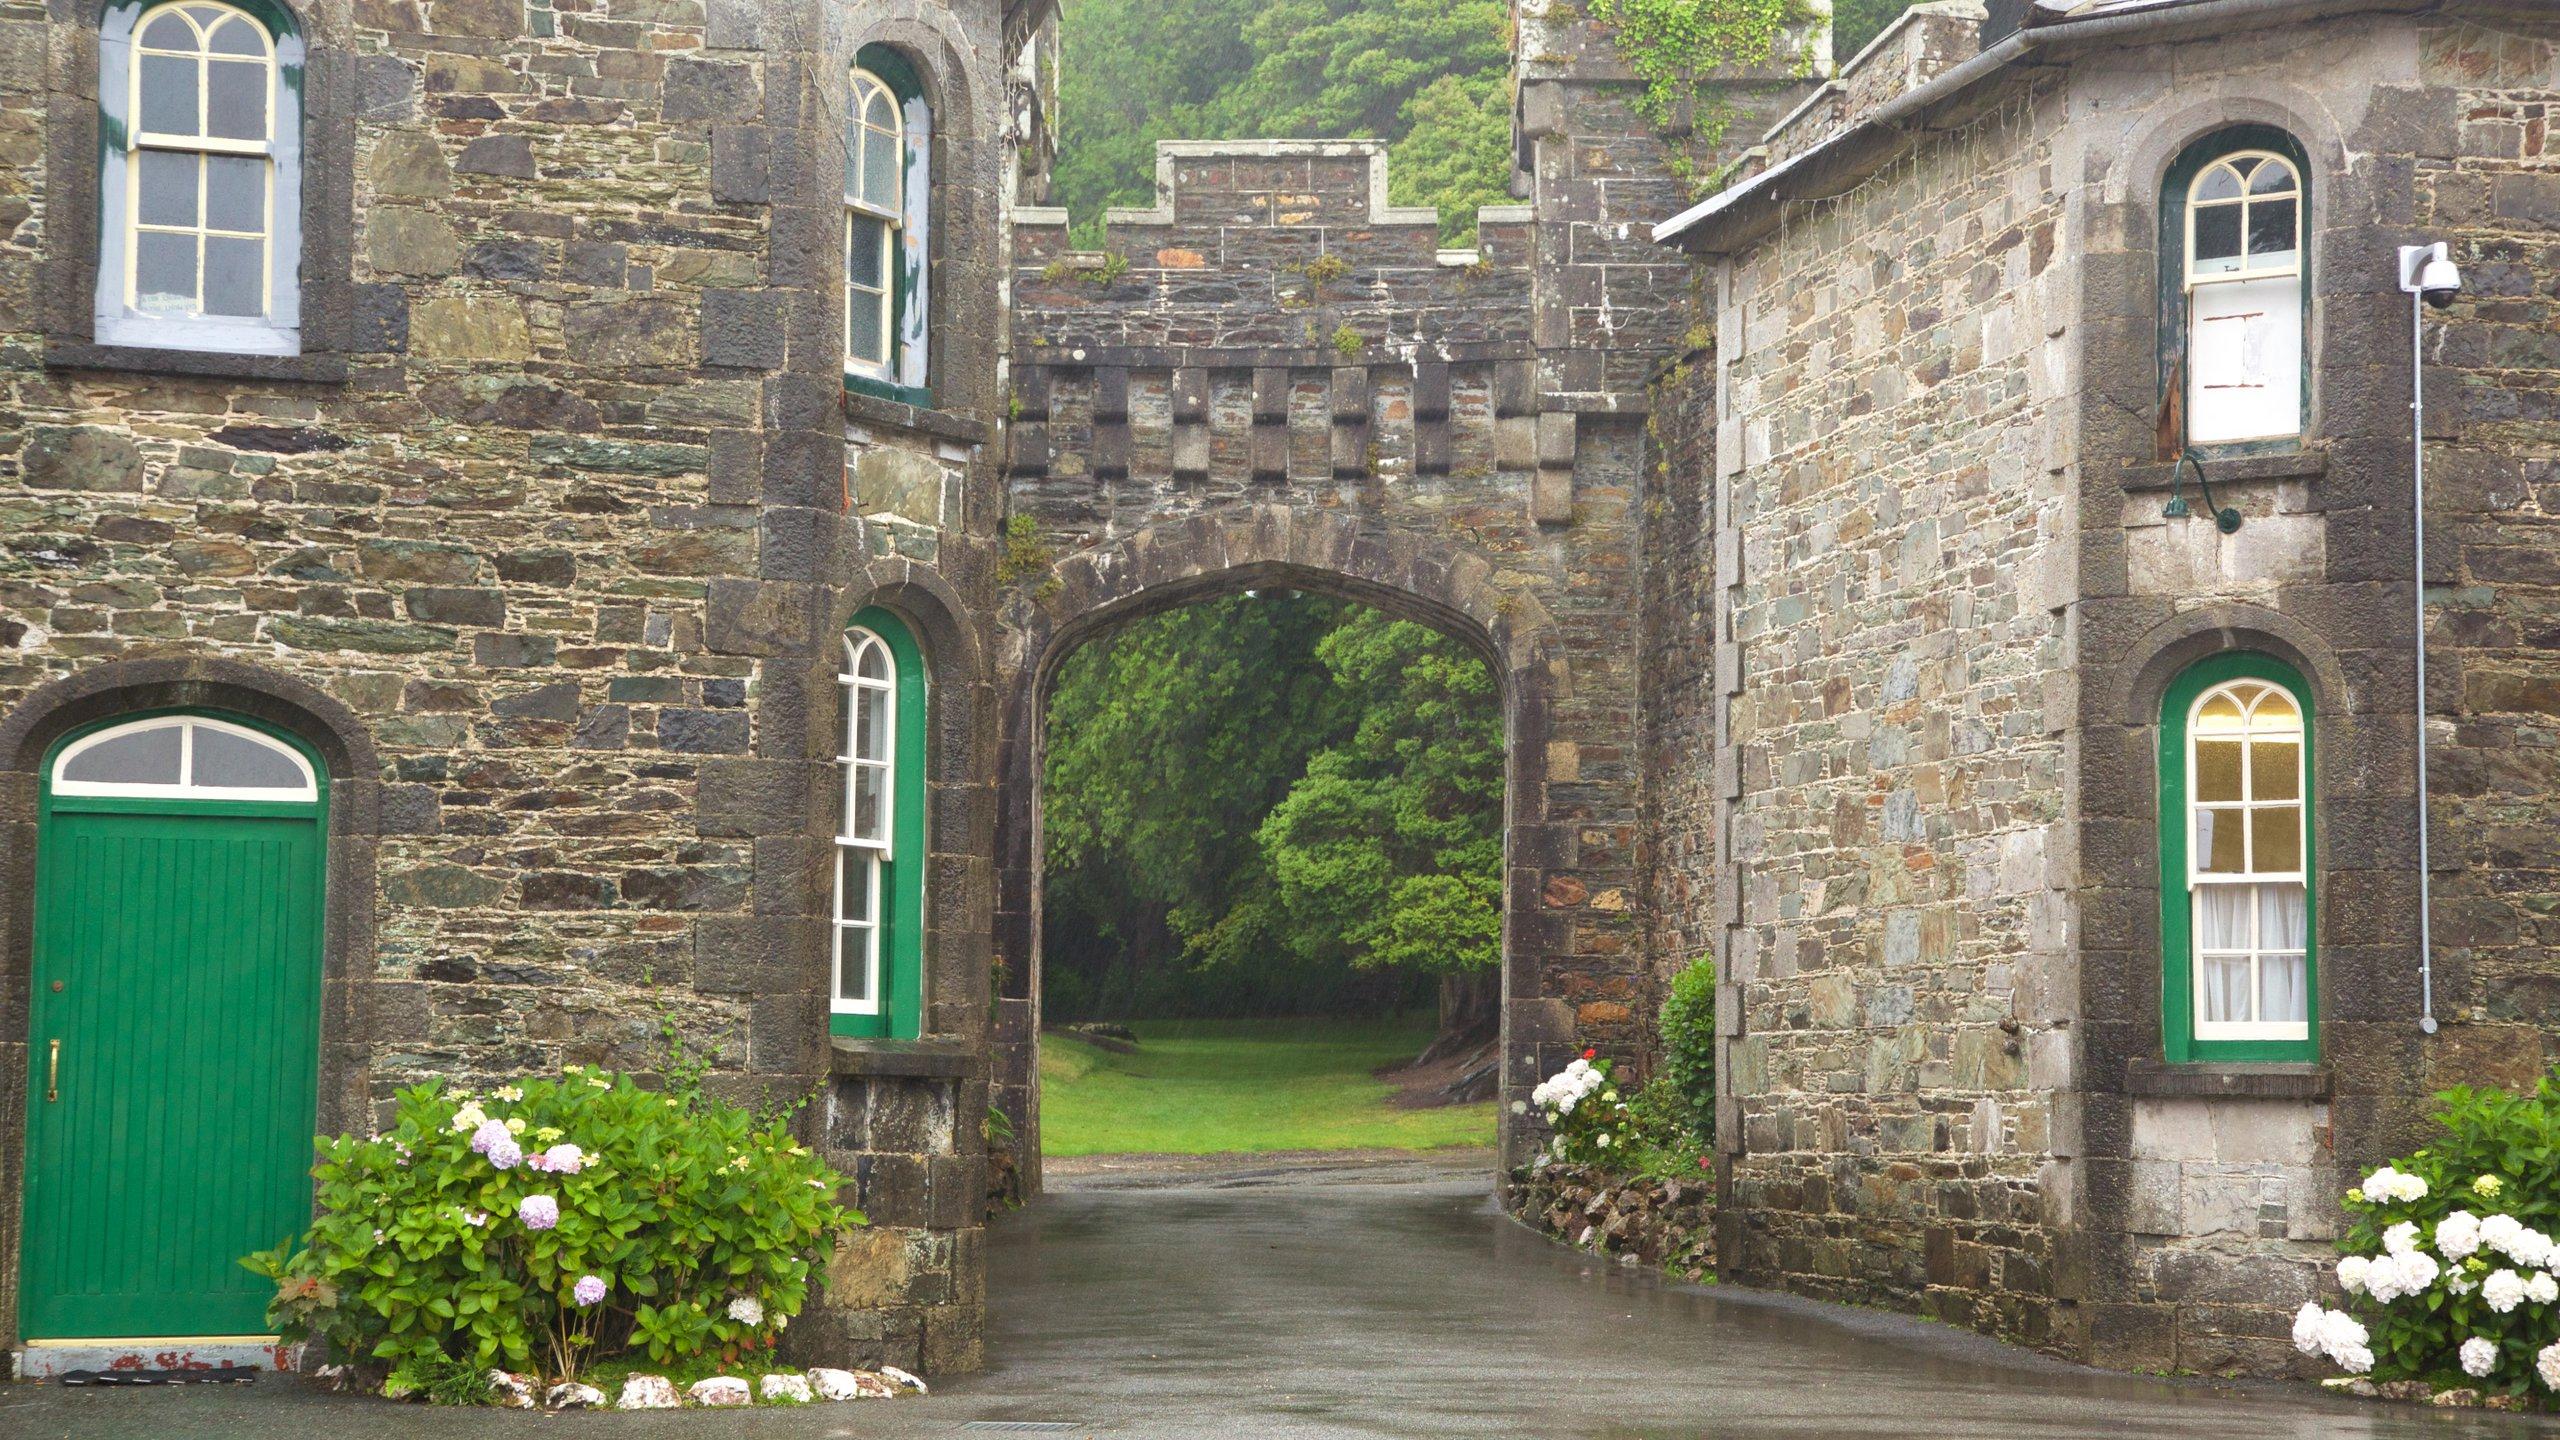 County Wexford, Ireland